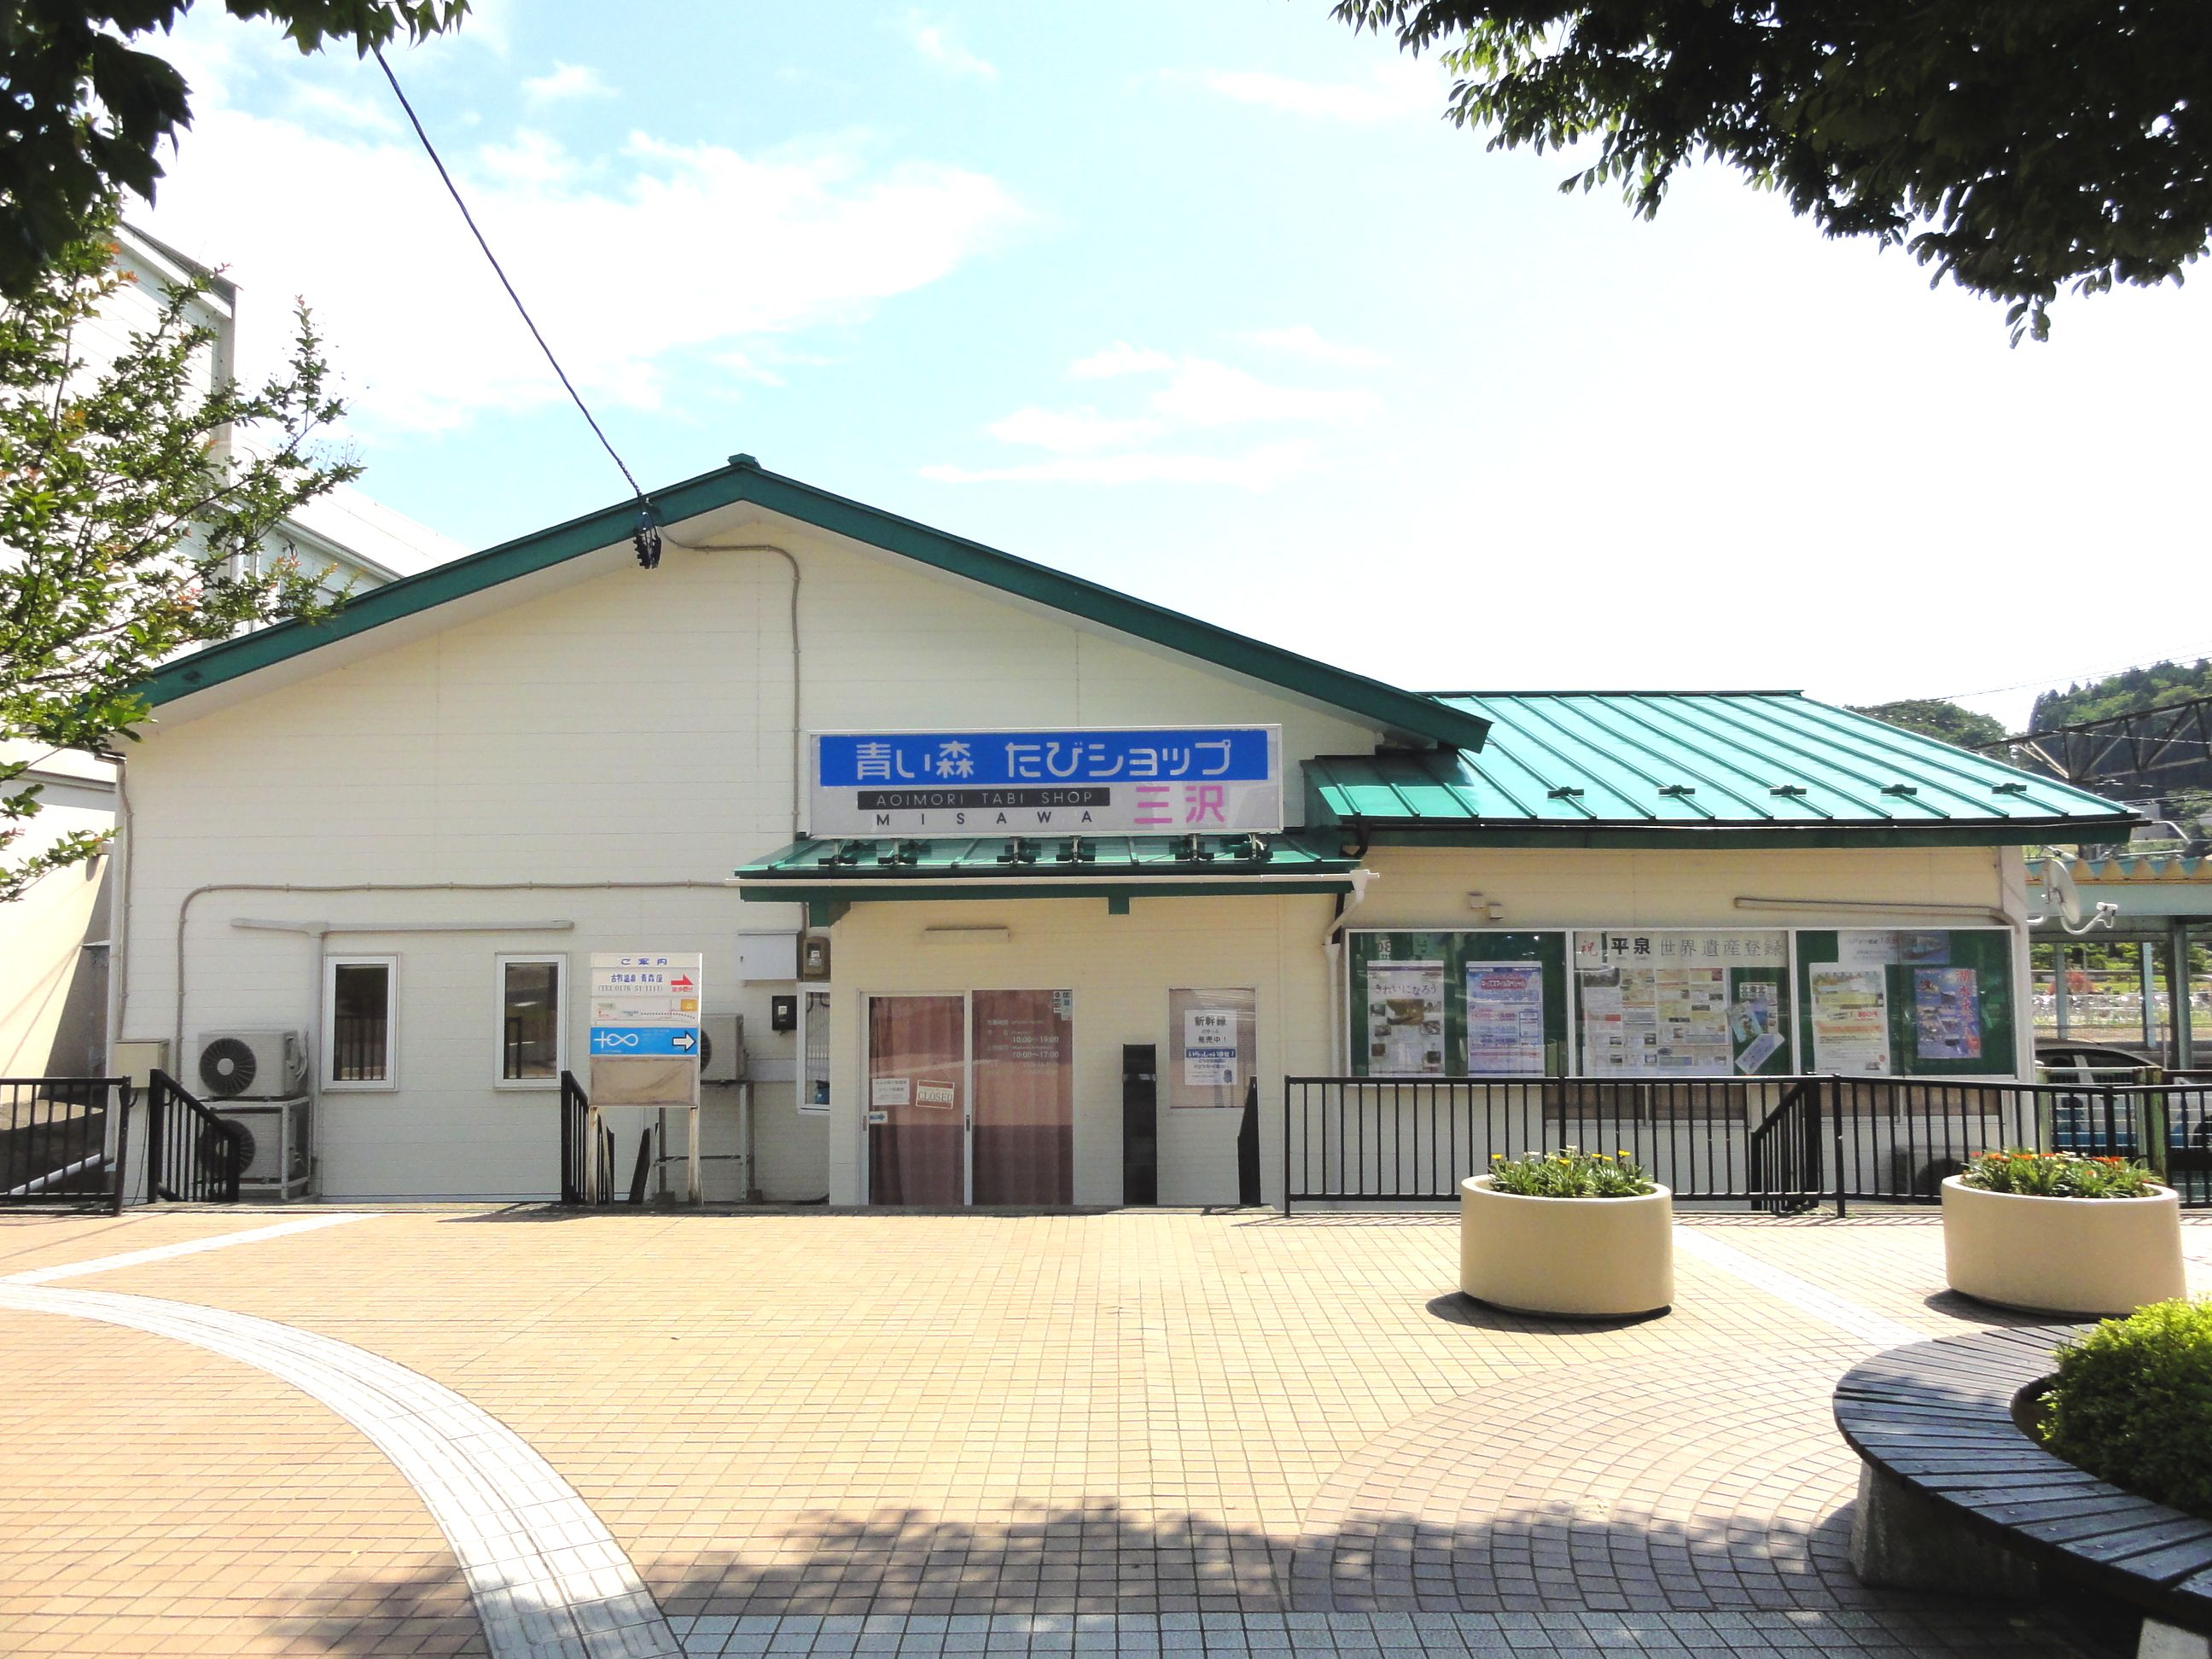 fileaoimoritabi shop misawajpg wikimedia commons